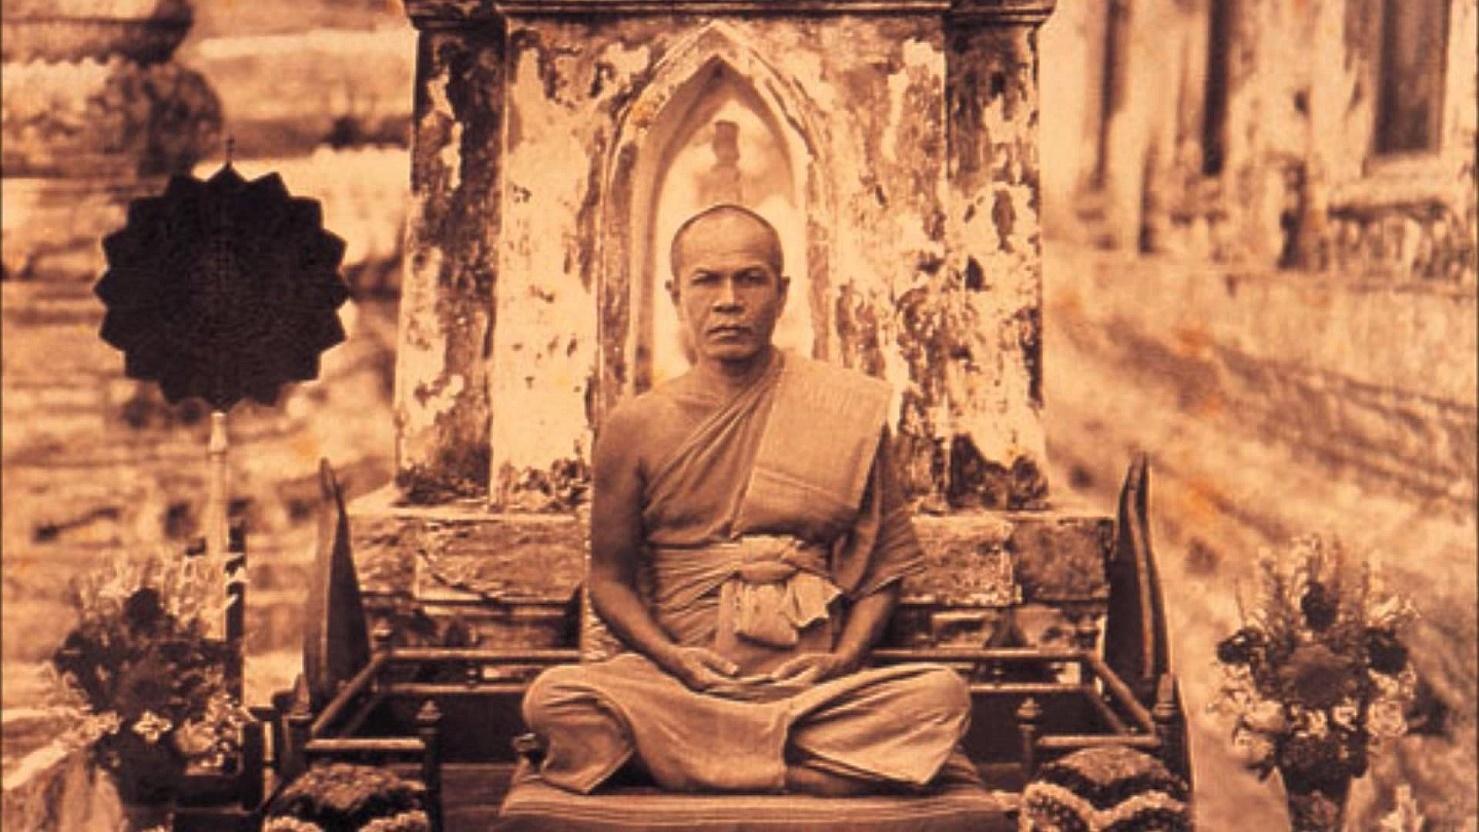 Luang Pho Sot